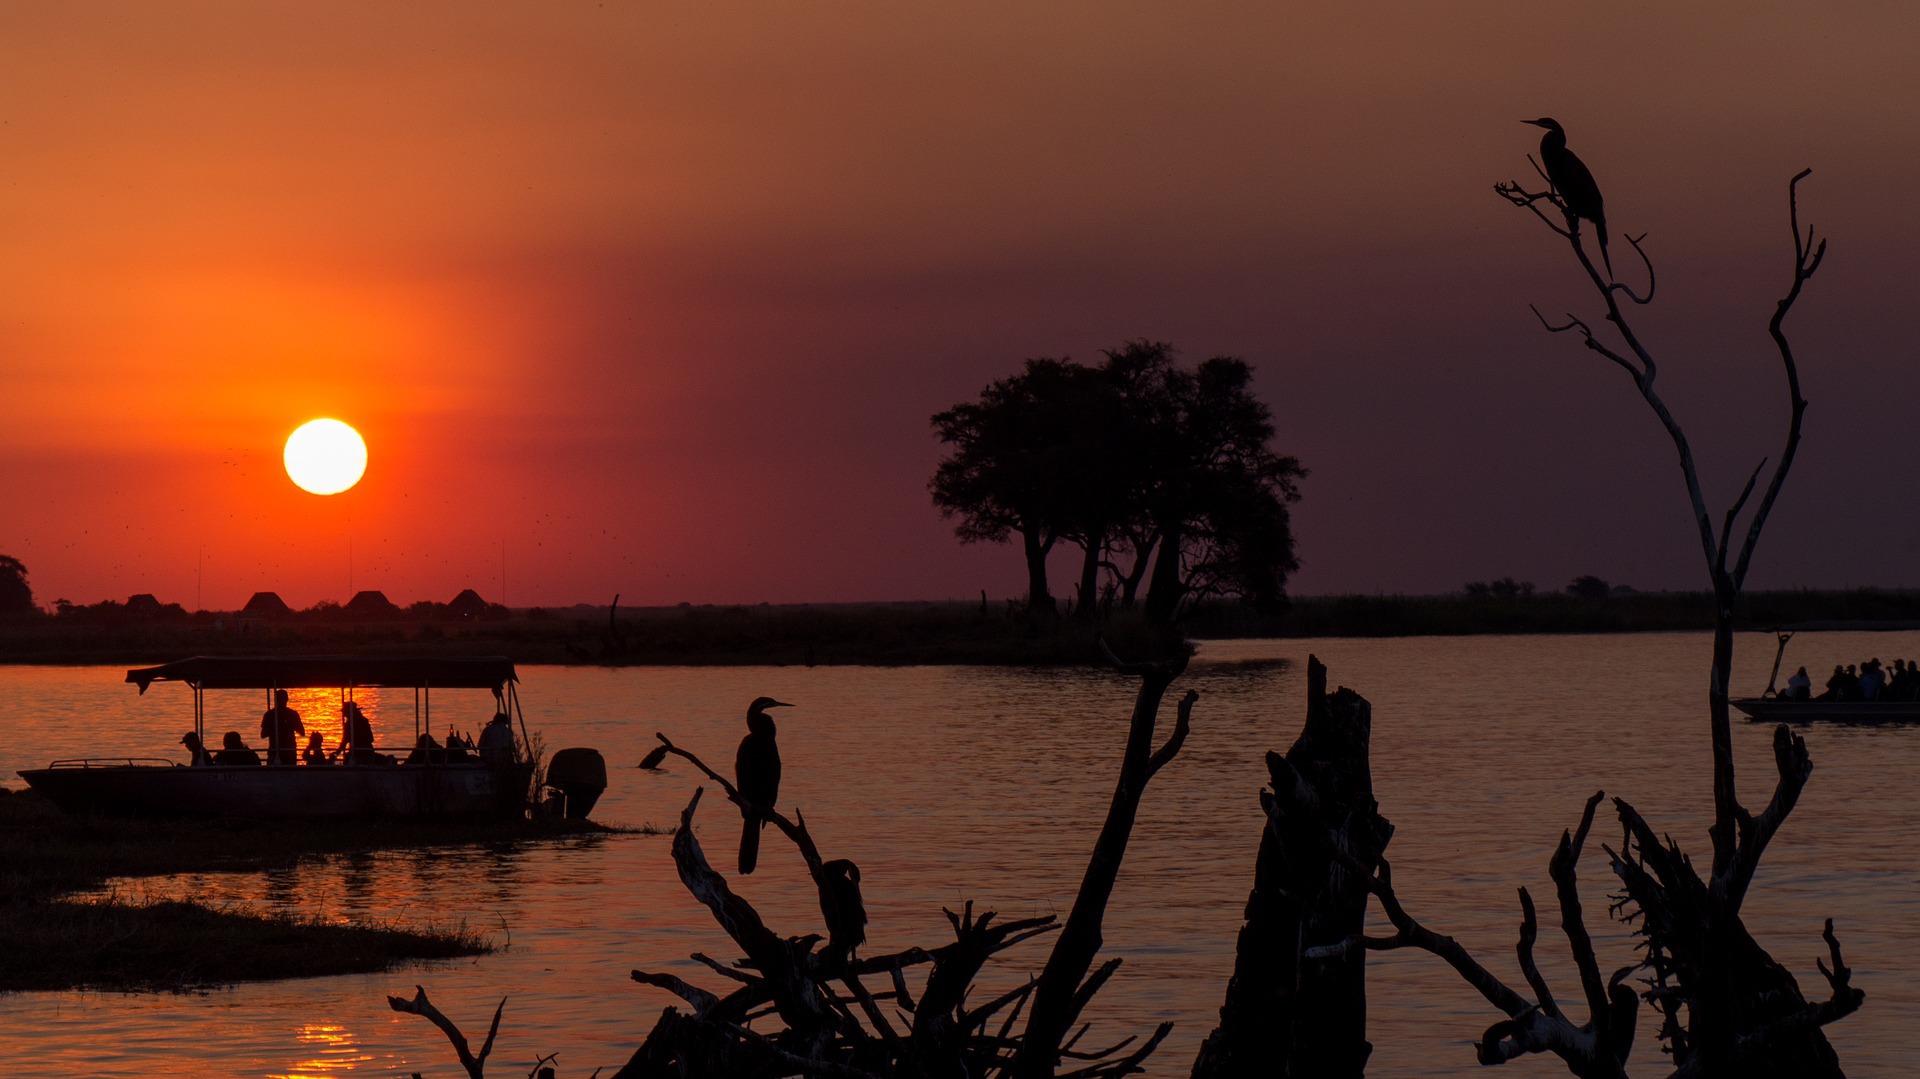 Bootssafari Chobe Sonnenuntergag